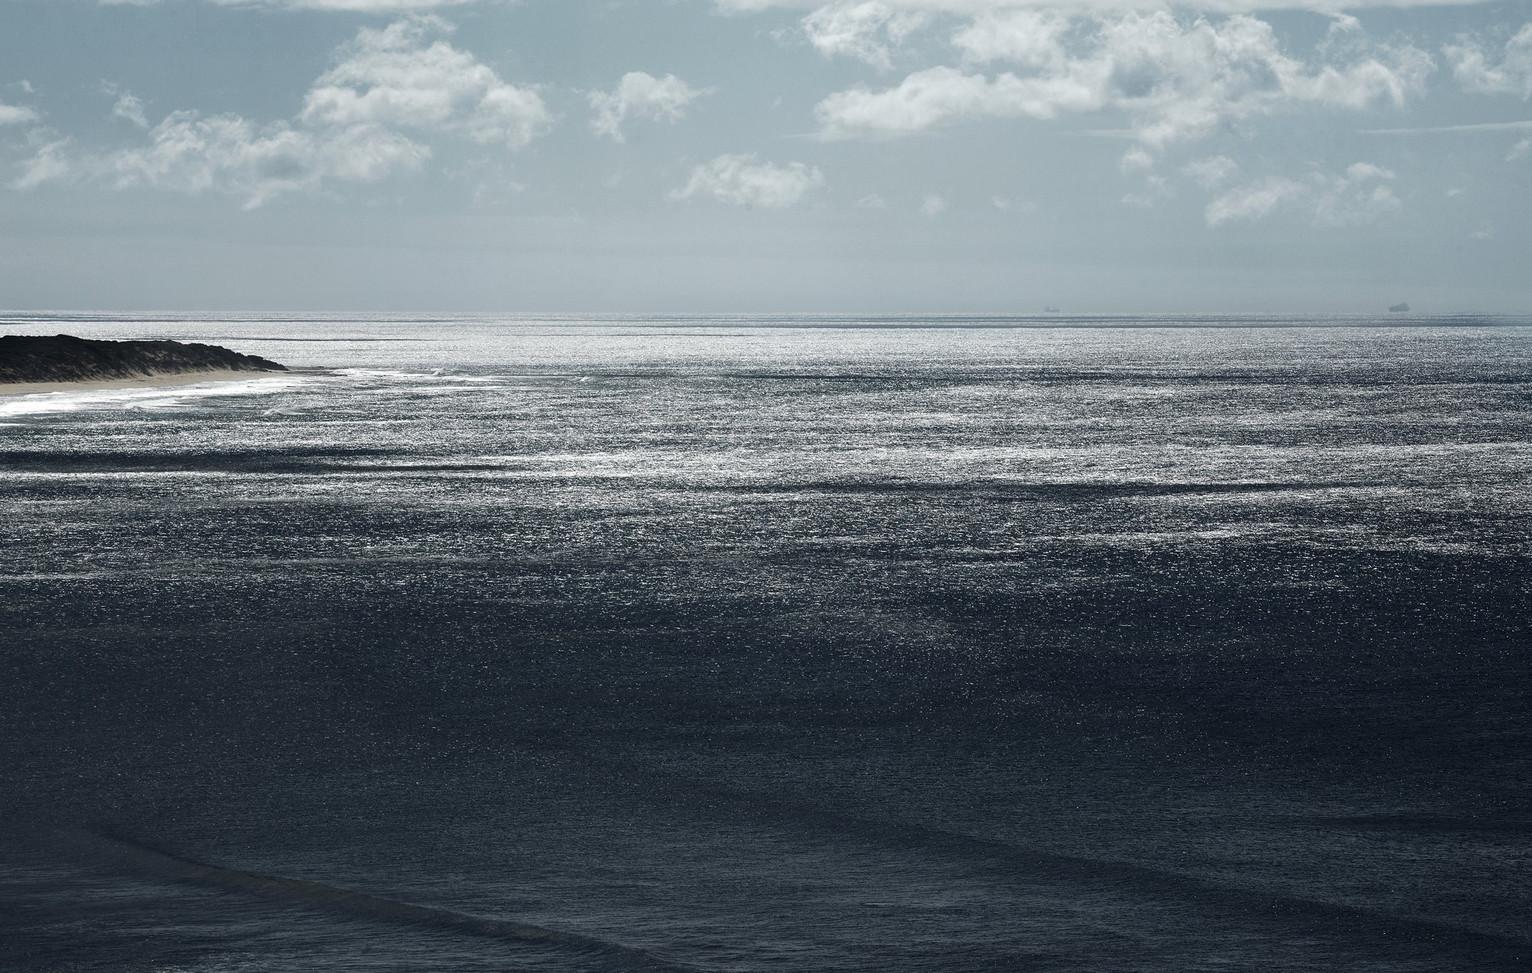 The Pacific Ocean, Great Ocean Road, Victoria